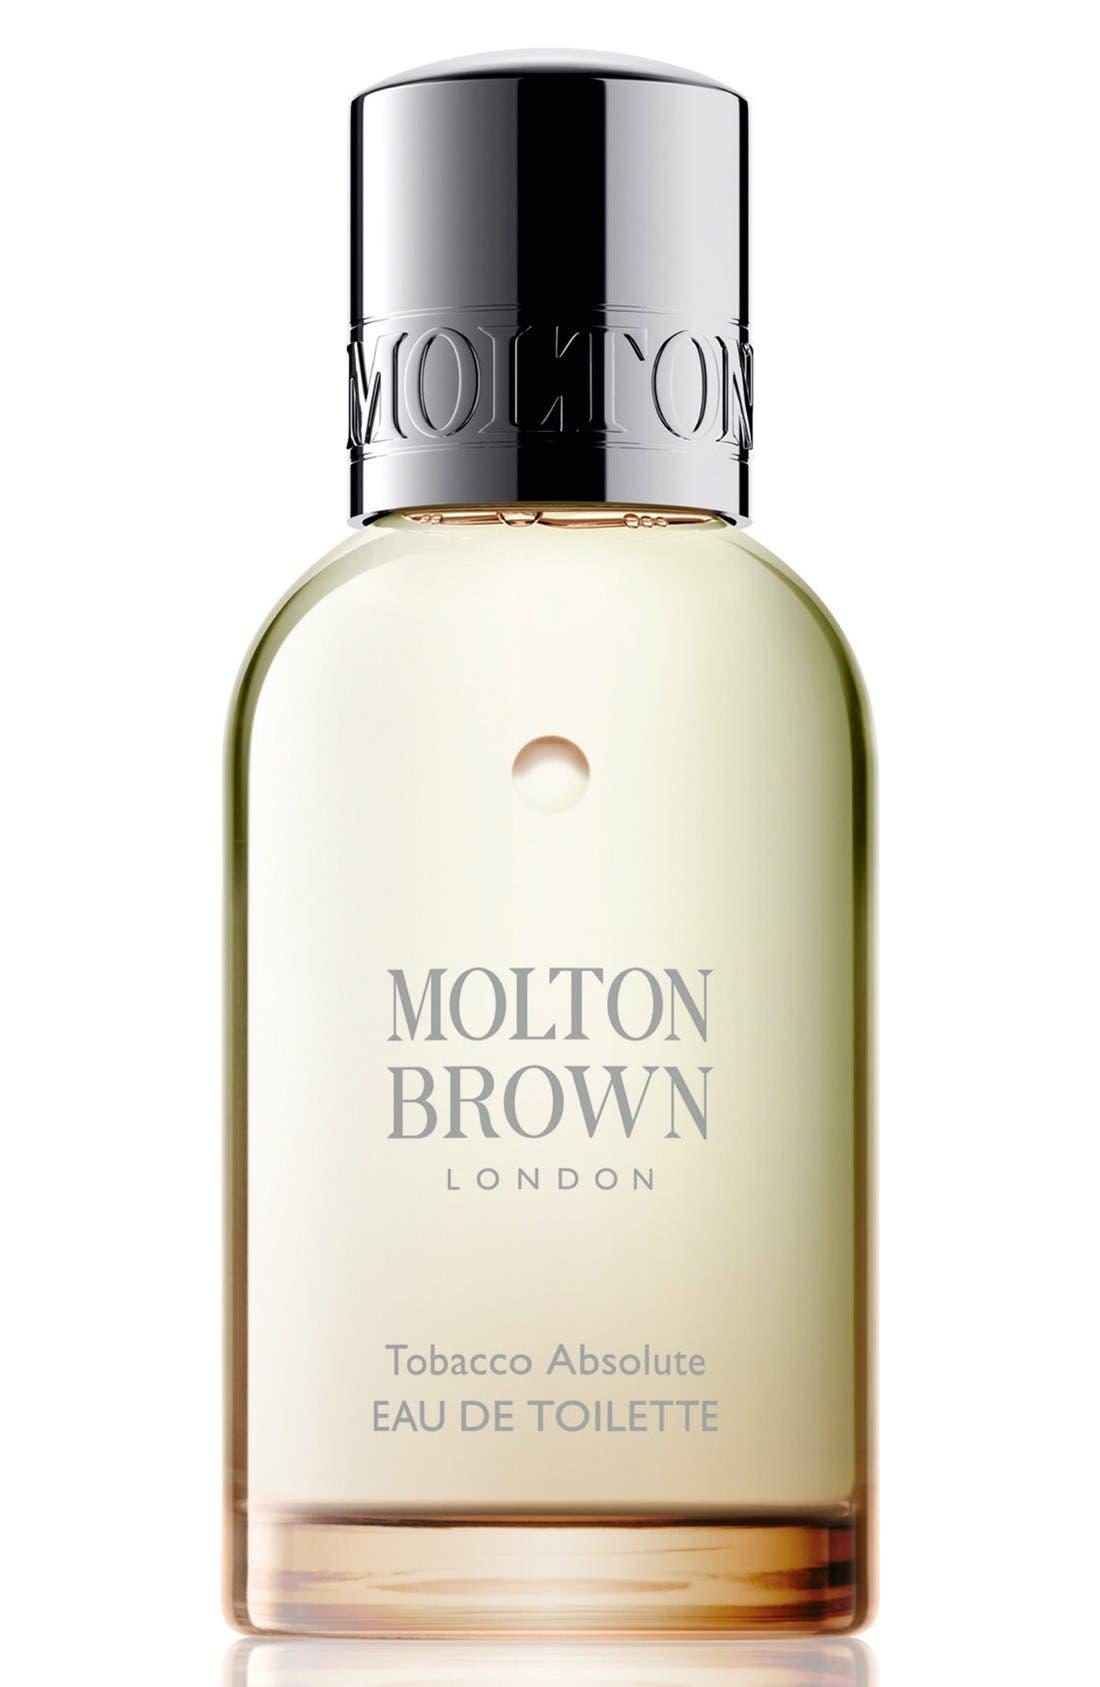 MOLTON BROWN London 'Tobacco Absolute' Eau de Toilette